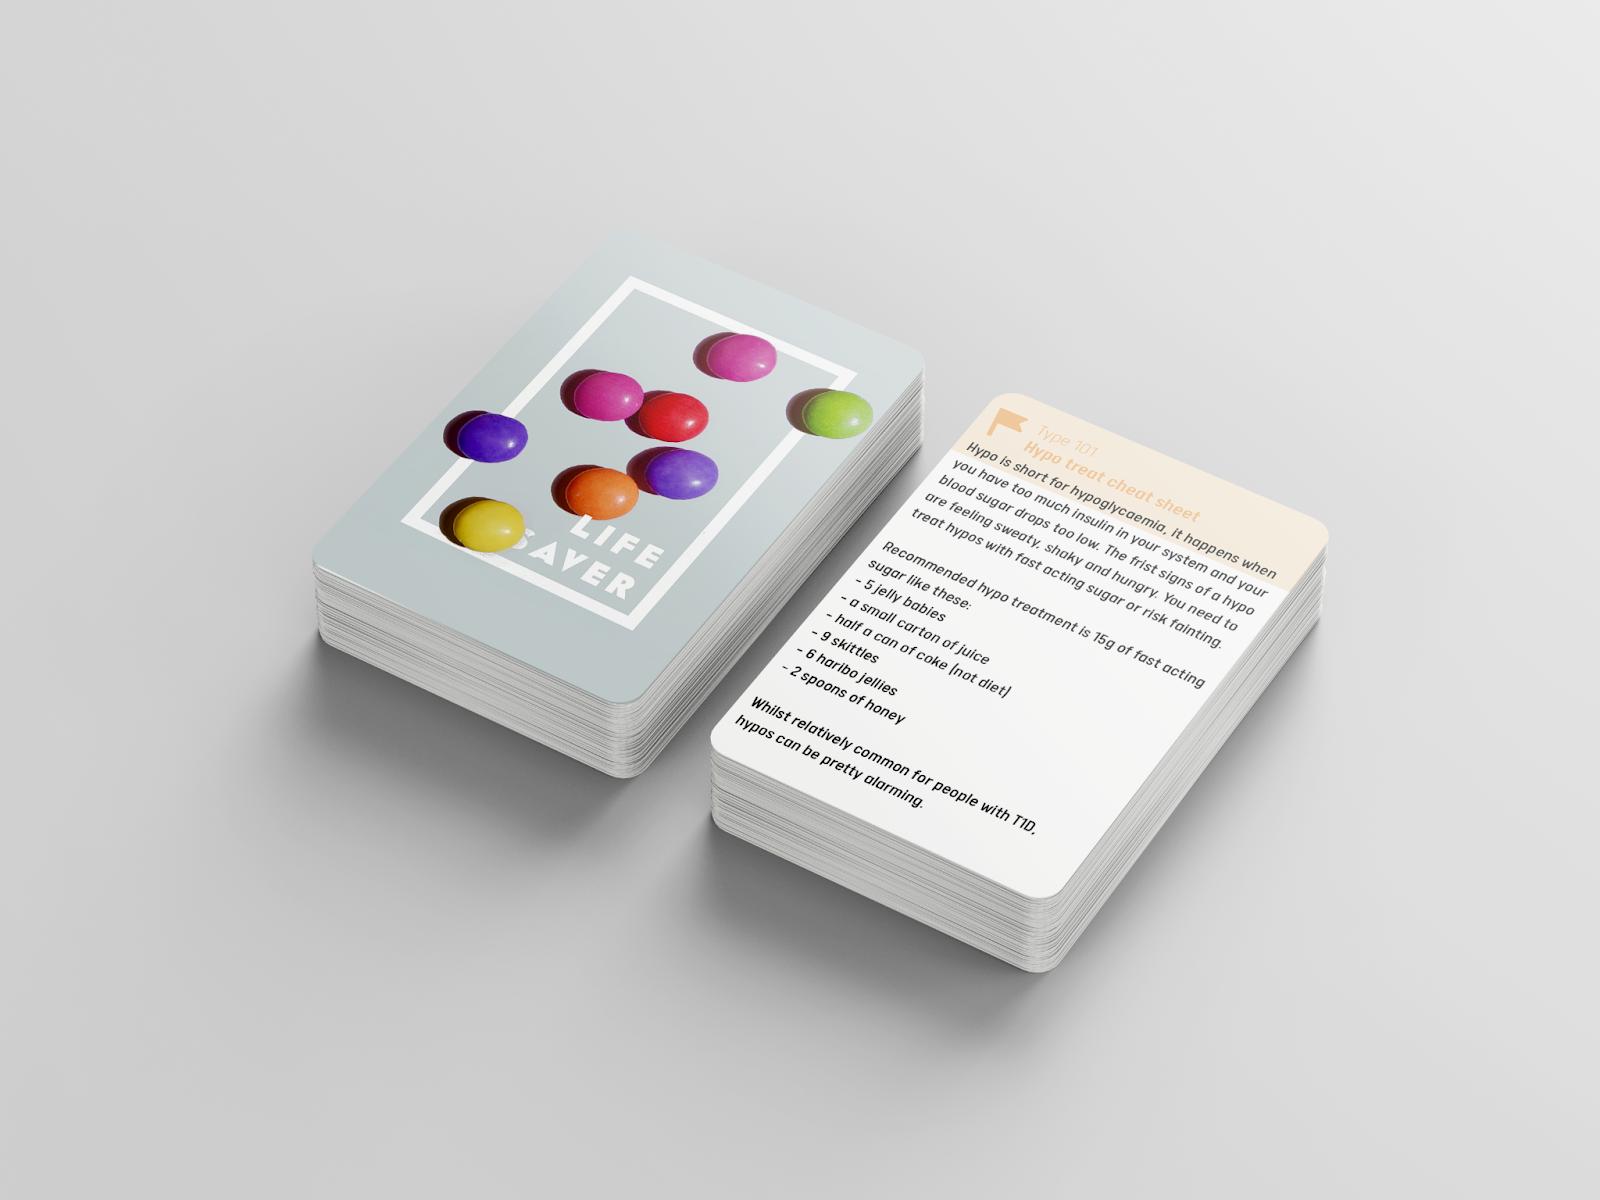 Diabetes by Design Companion Cards